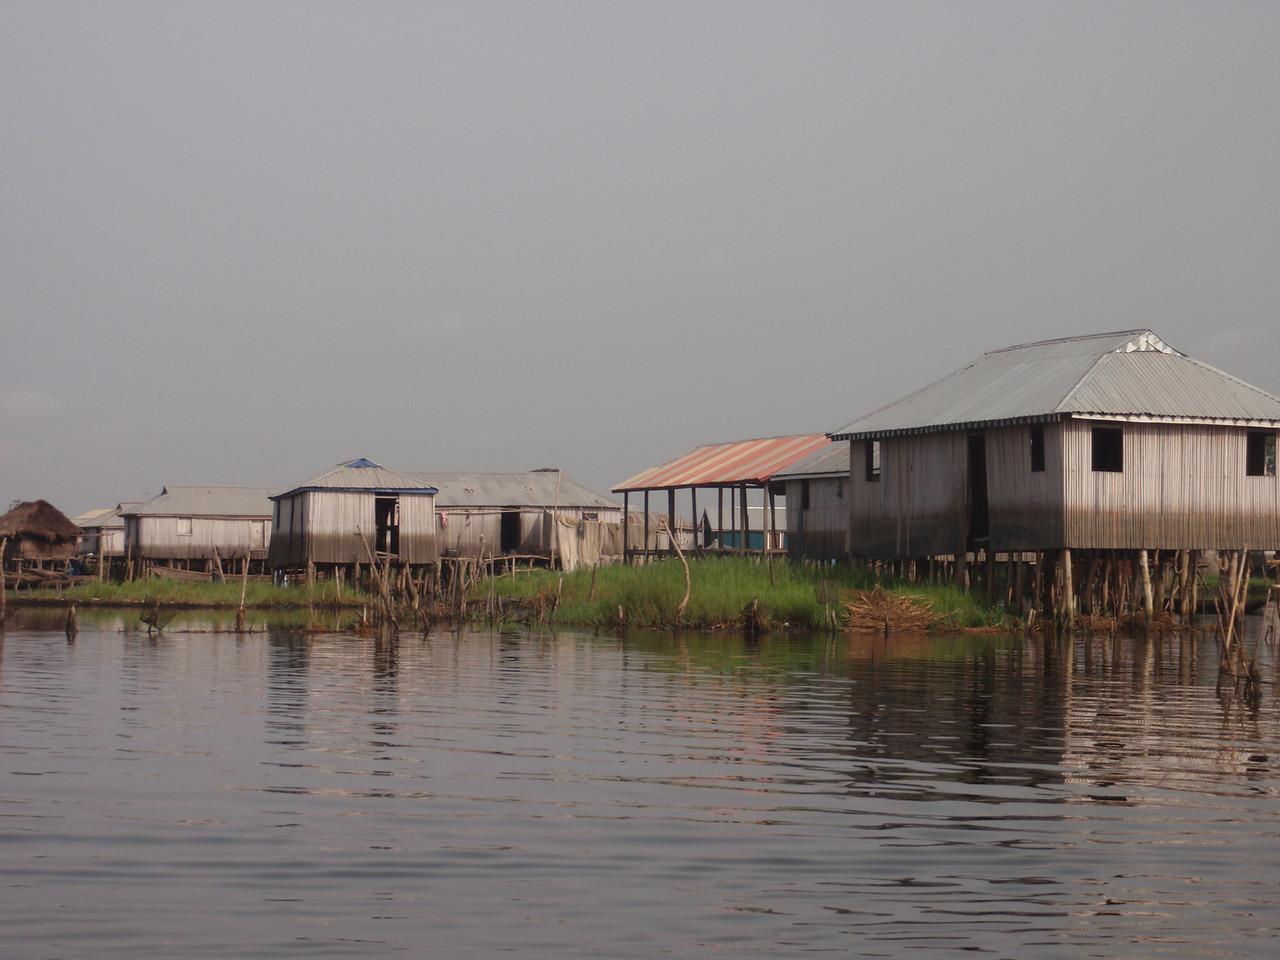 086_Ganvie Lake Community  Lake Nokoue  Bamboo Huts on Stilts